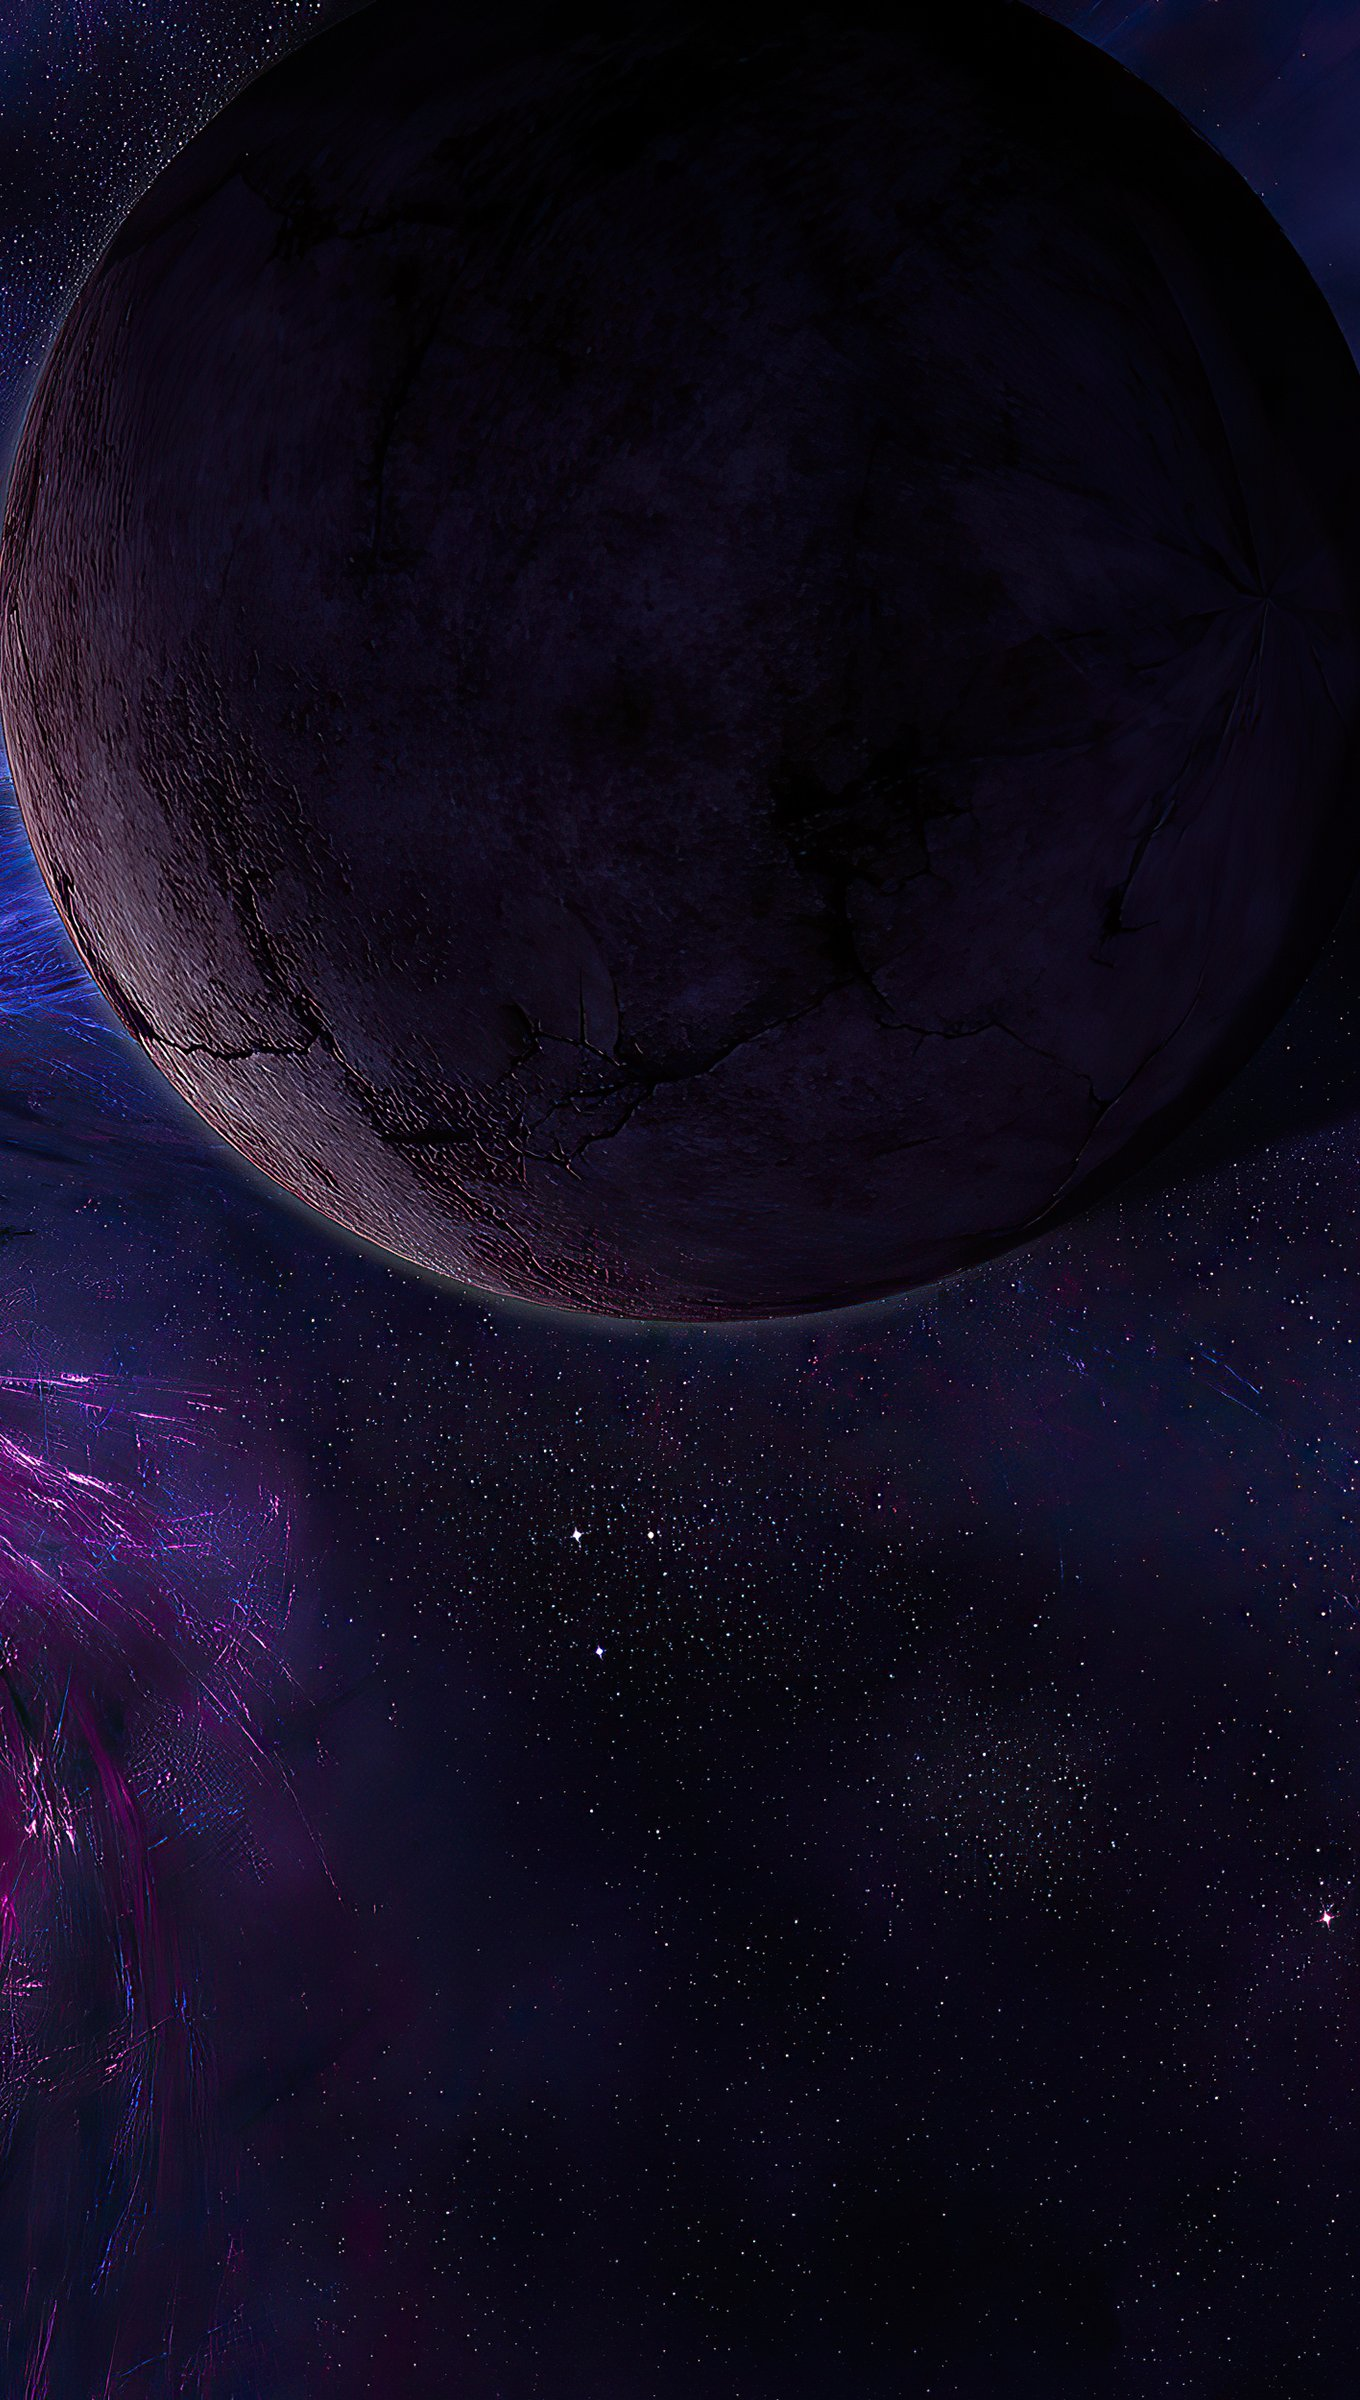 Wallpaper Sci fi Planets Vertical